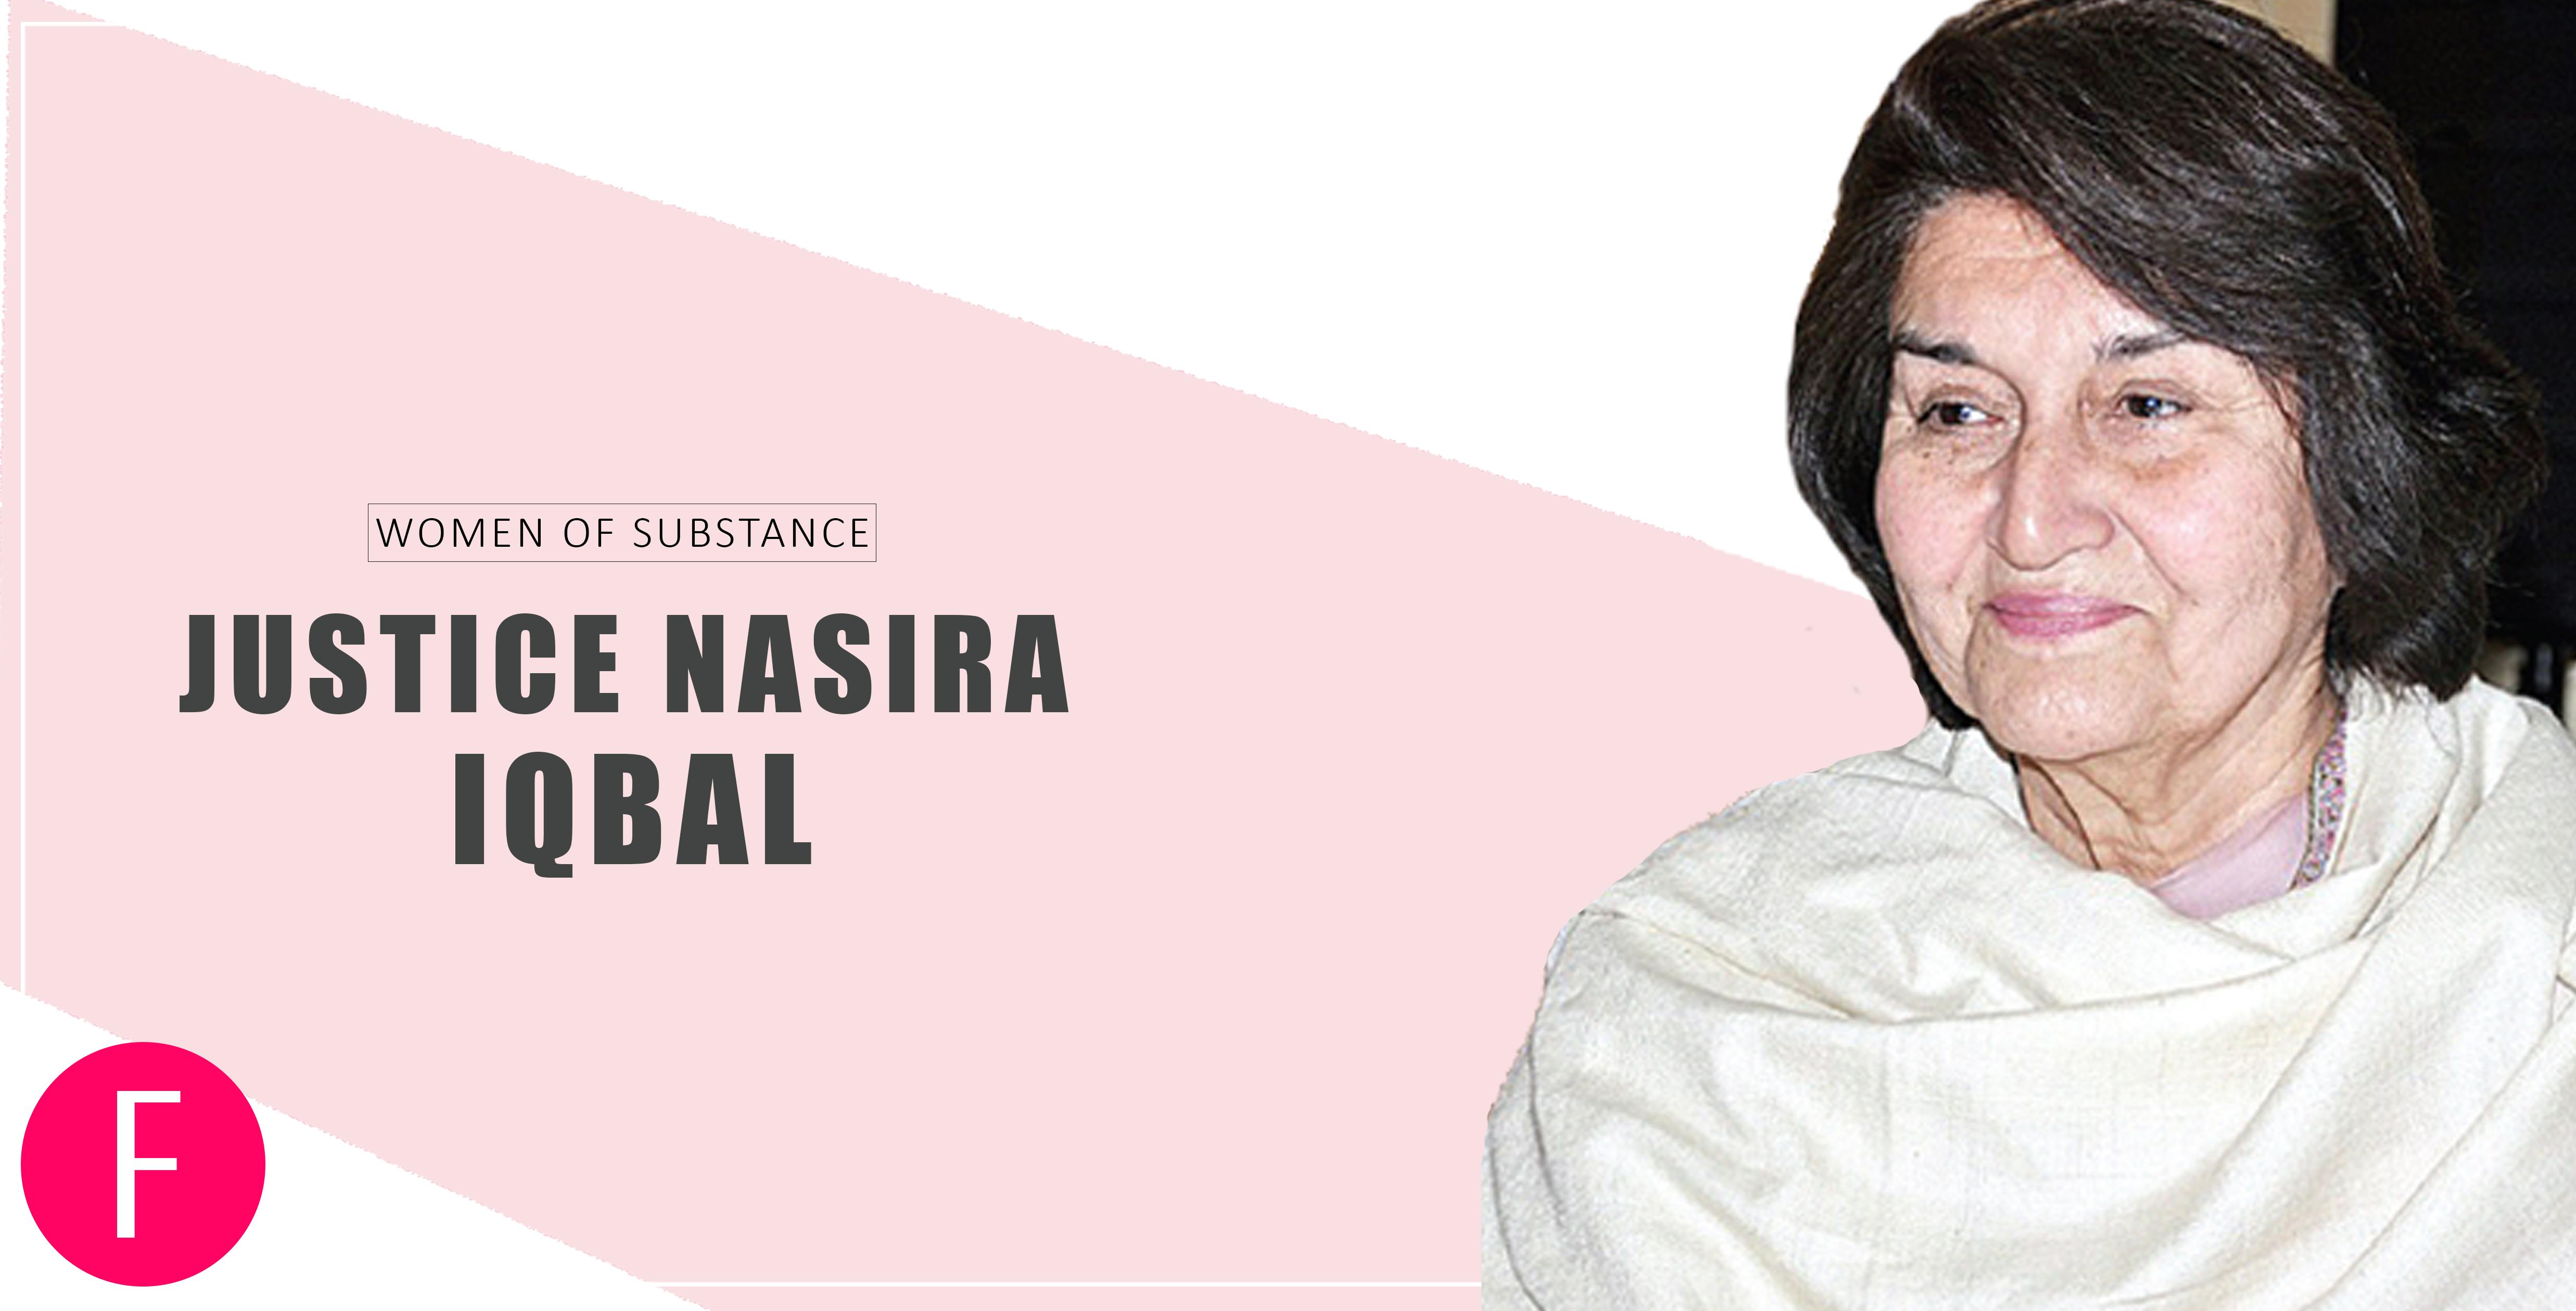 Justice Nasira Iqbal